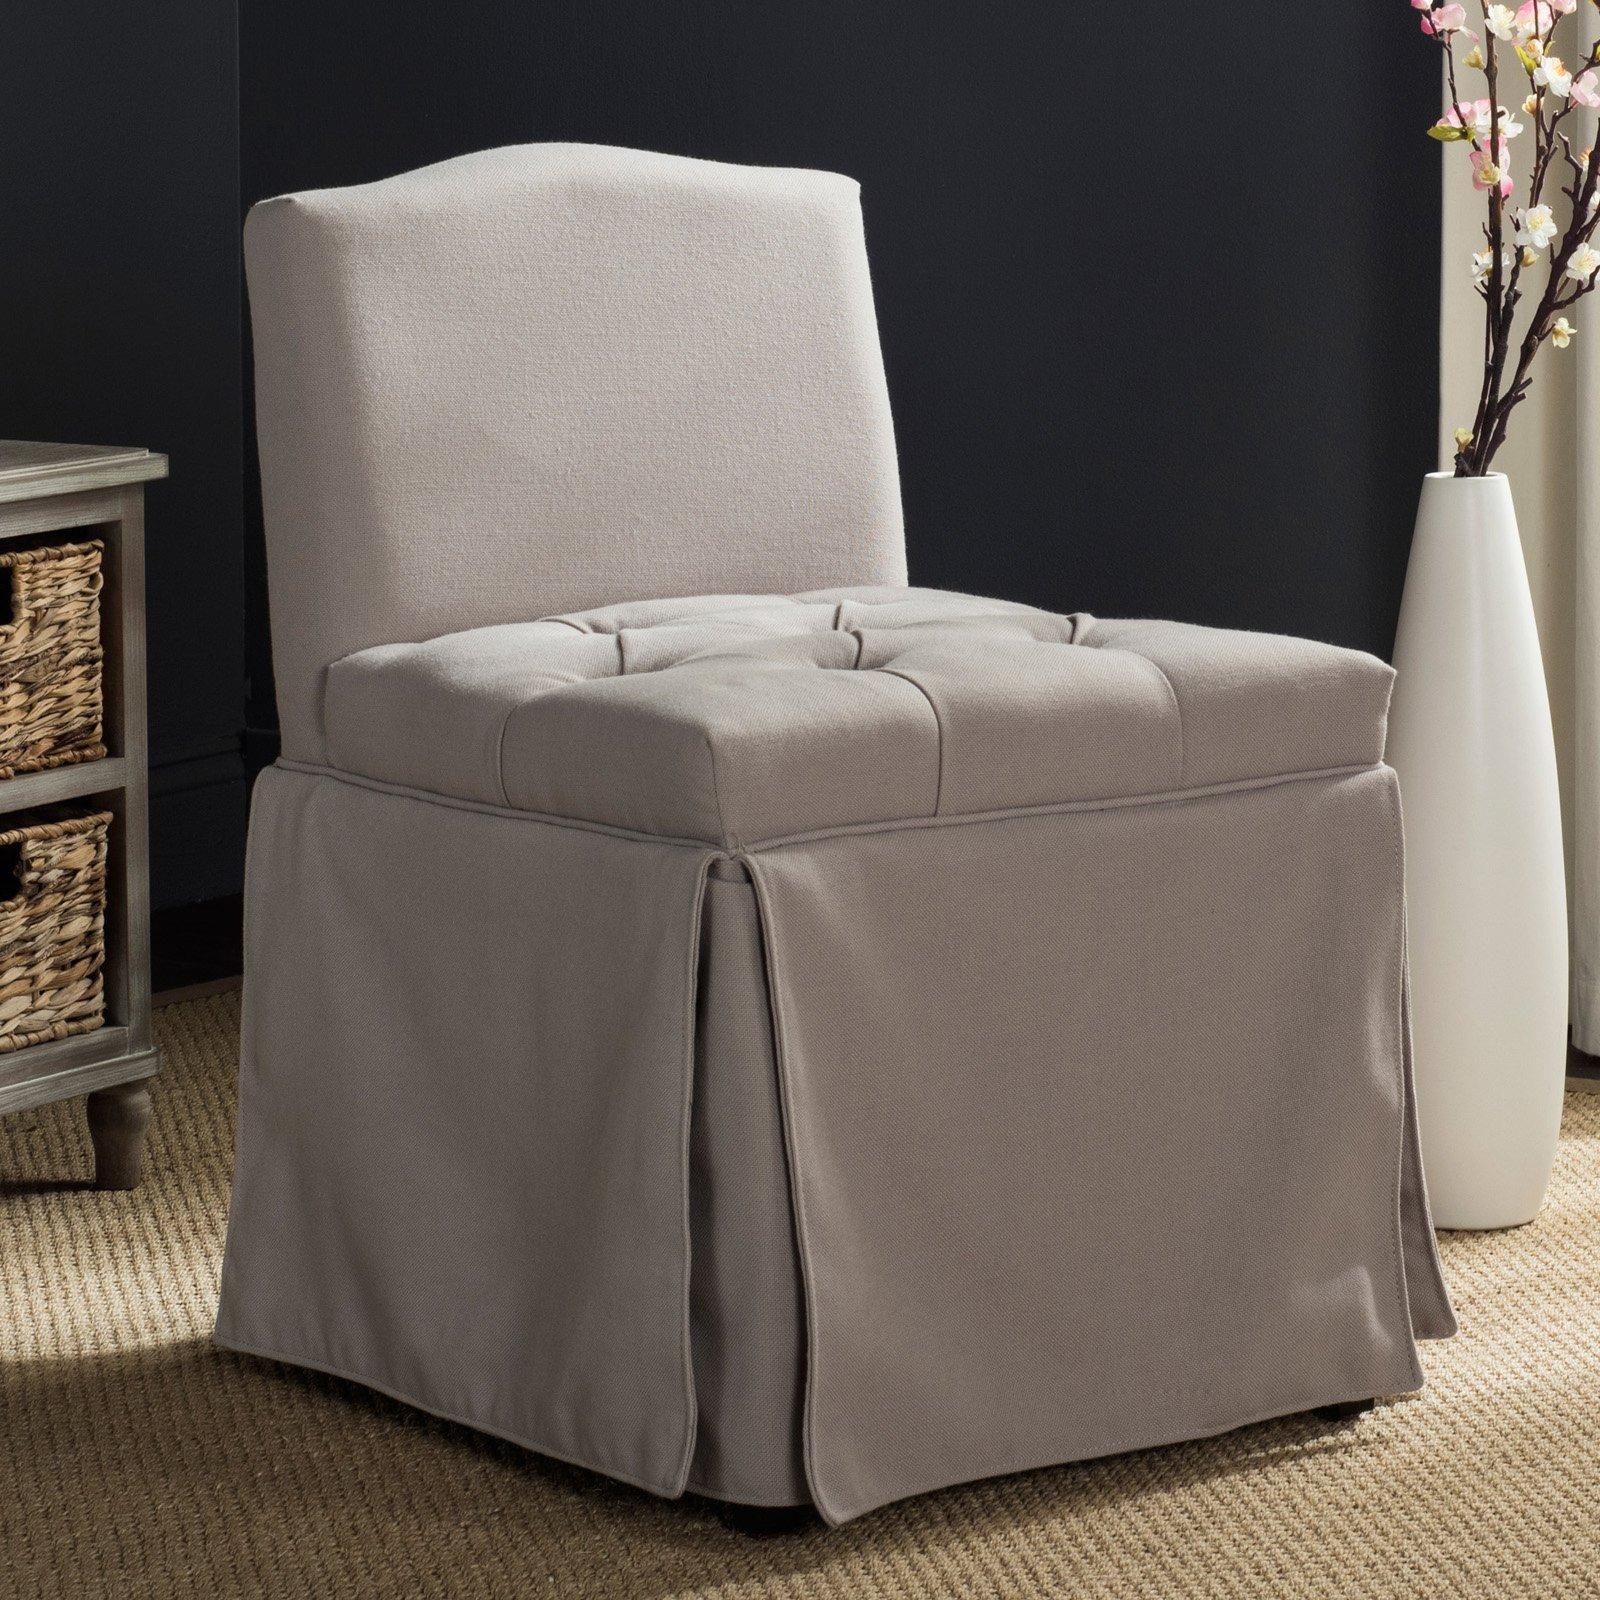 Safavieh Betsy Vanity Chair, Multiple Colors